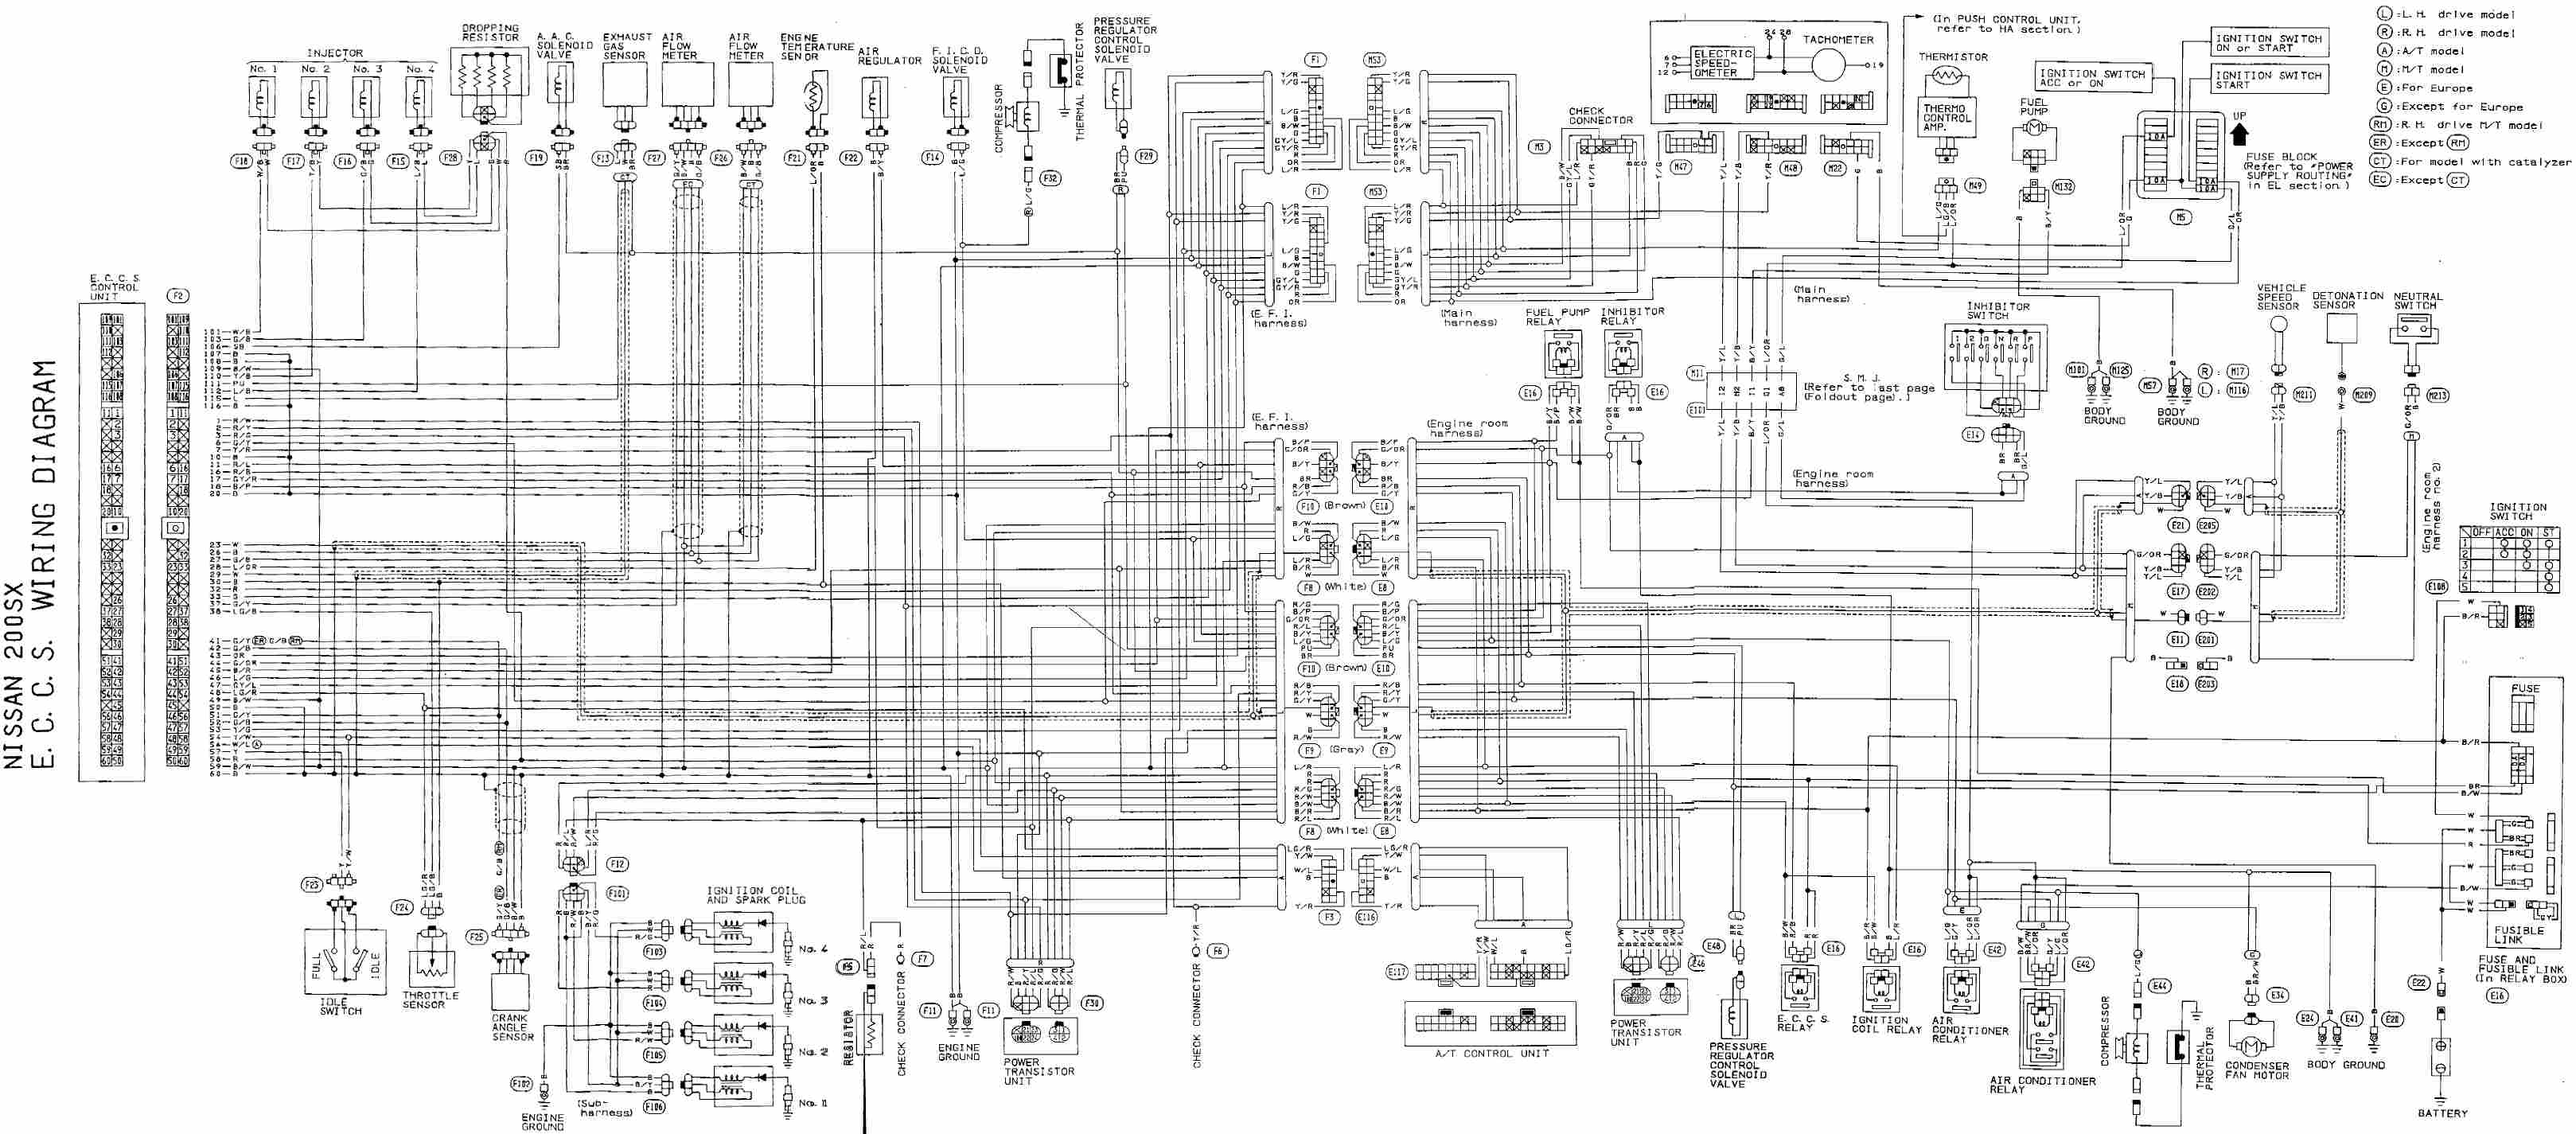 Wiring Diagram 1992 Nissan Sentra Se R - All Wiring Diagram Data